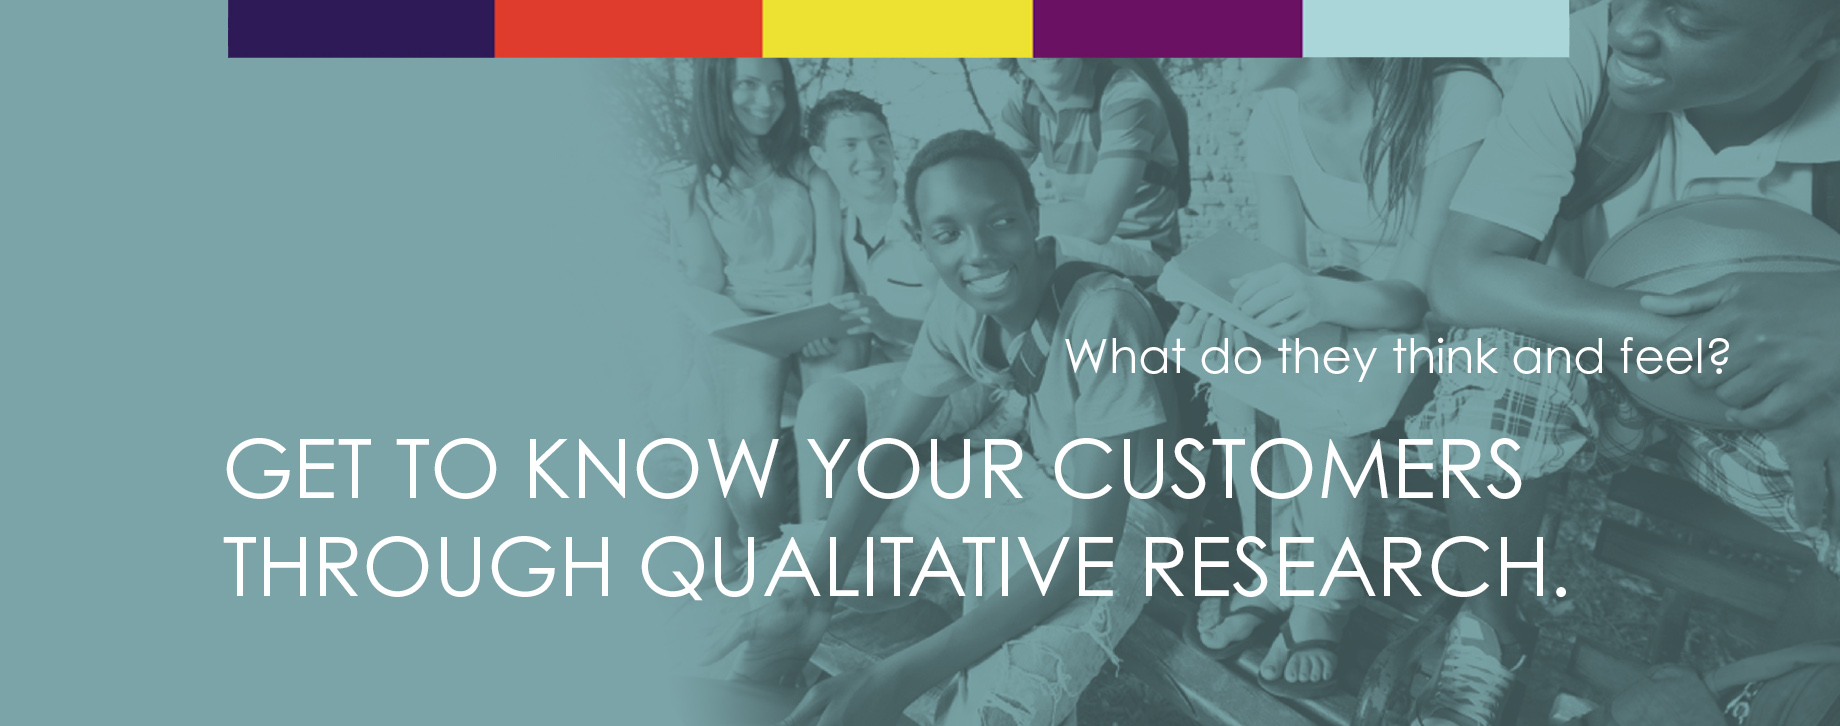 Clift Focus Group Moderator - Qualitative Research 02.jpg